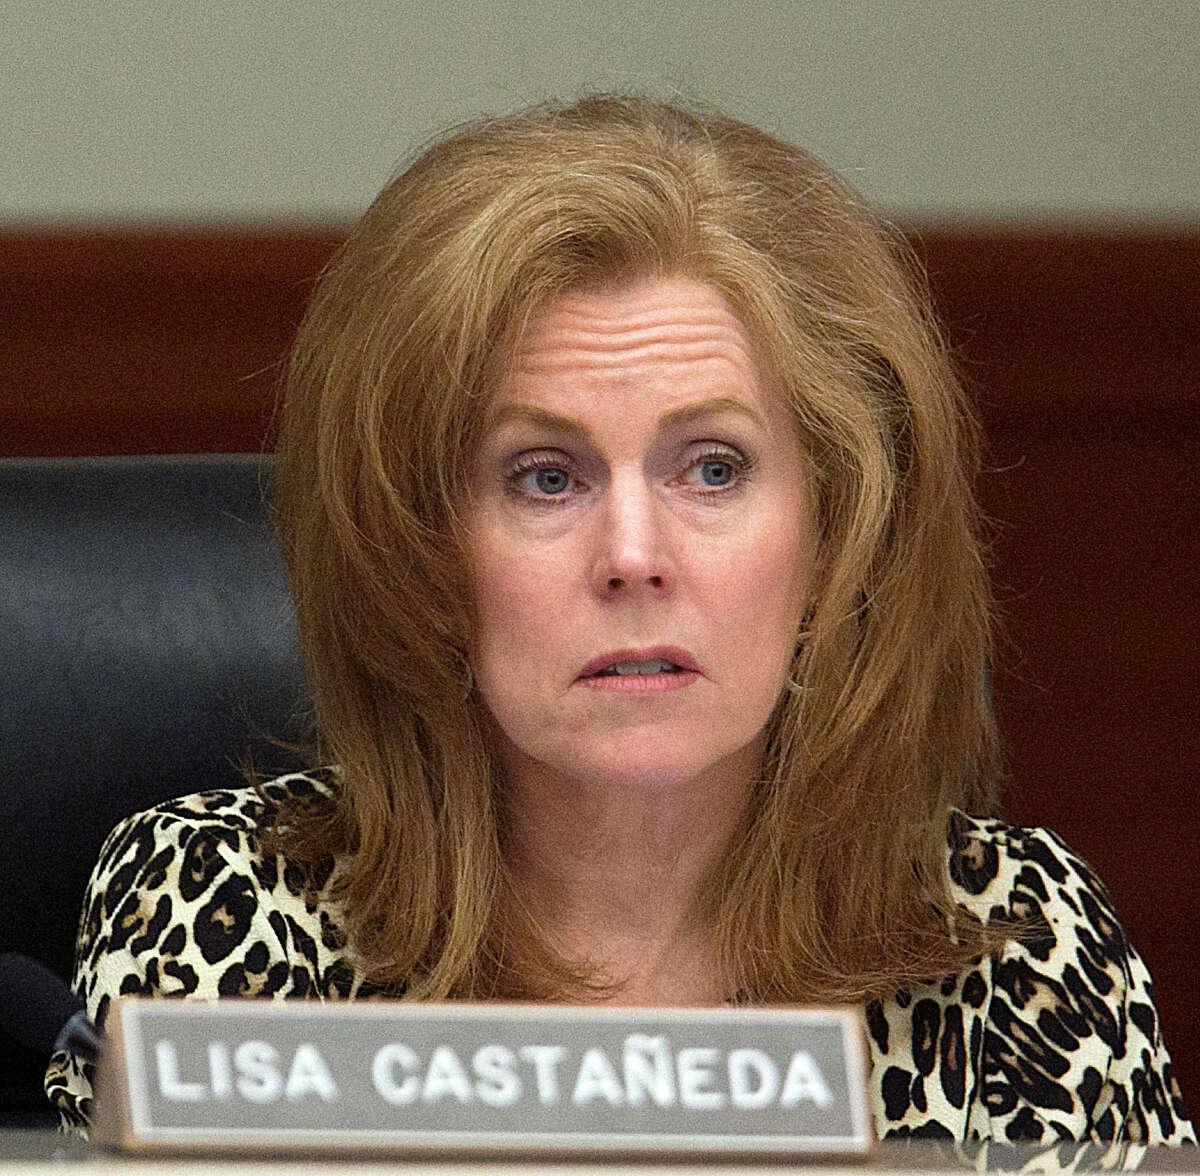 Metropolitan Transit Authority board member Lisa Castaneda during the board's monthly meeting on Jan. 25.